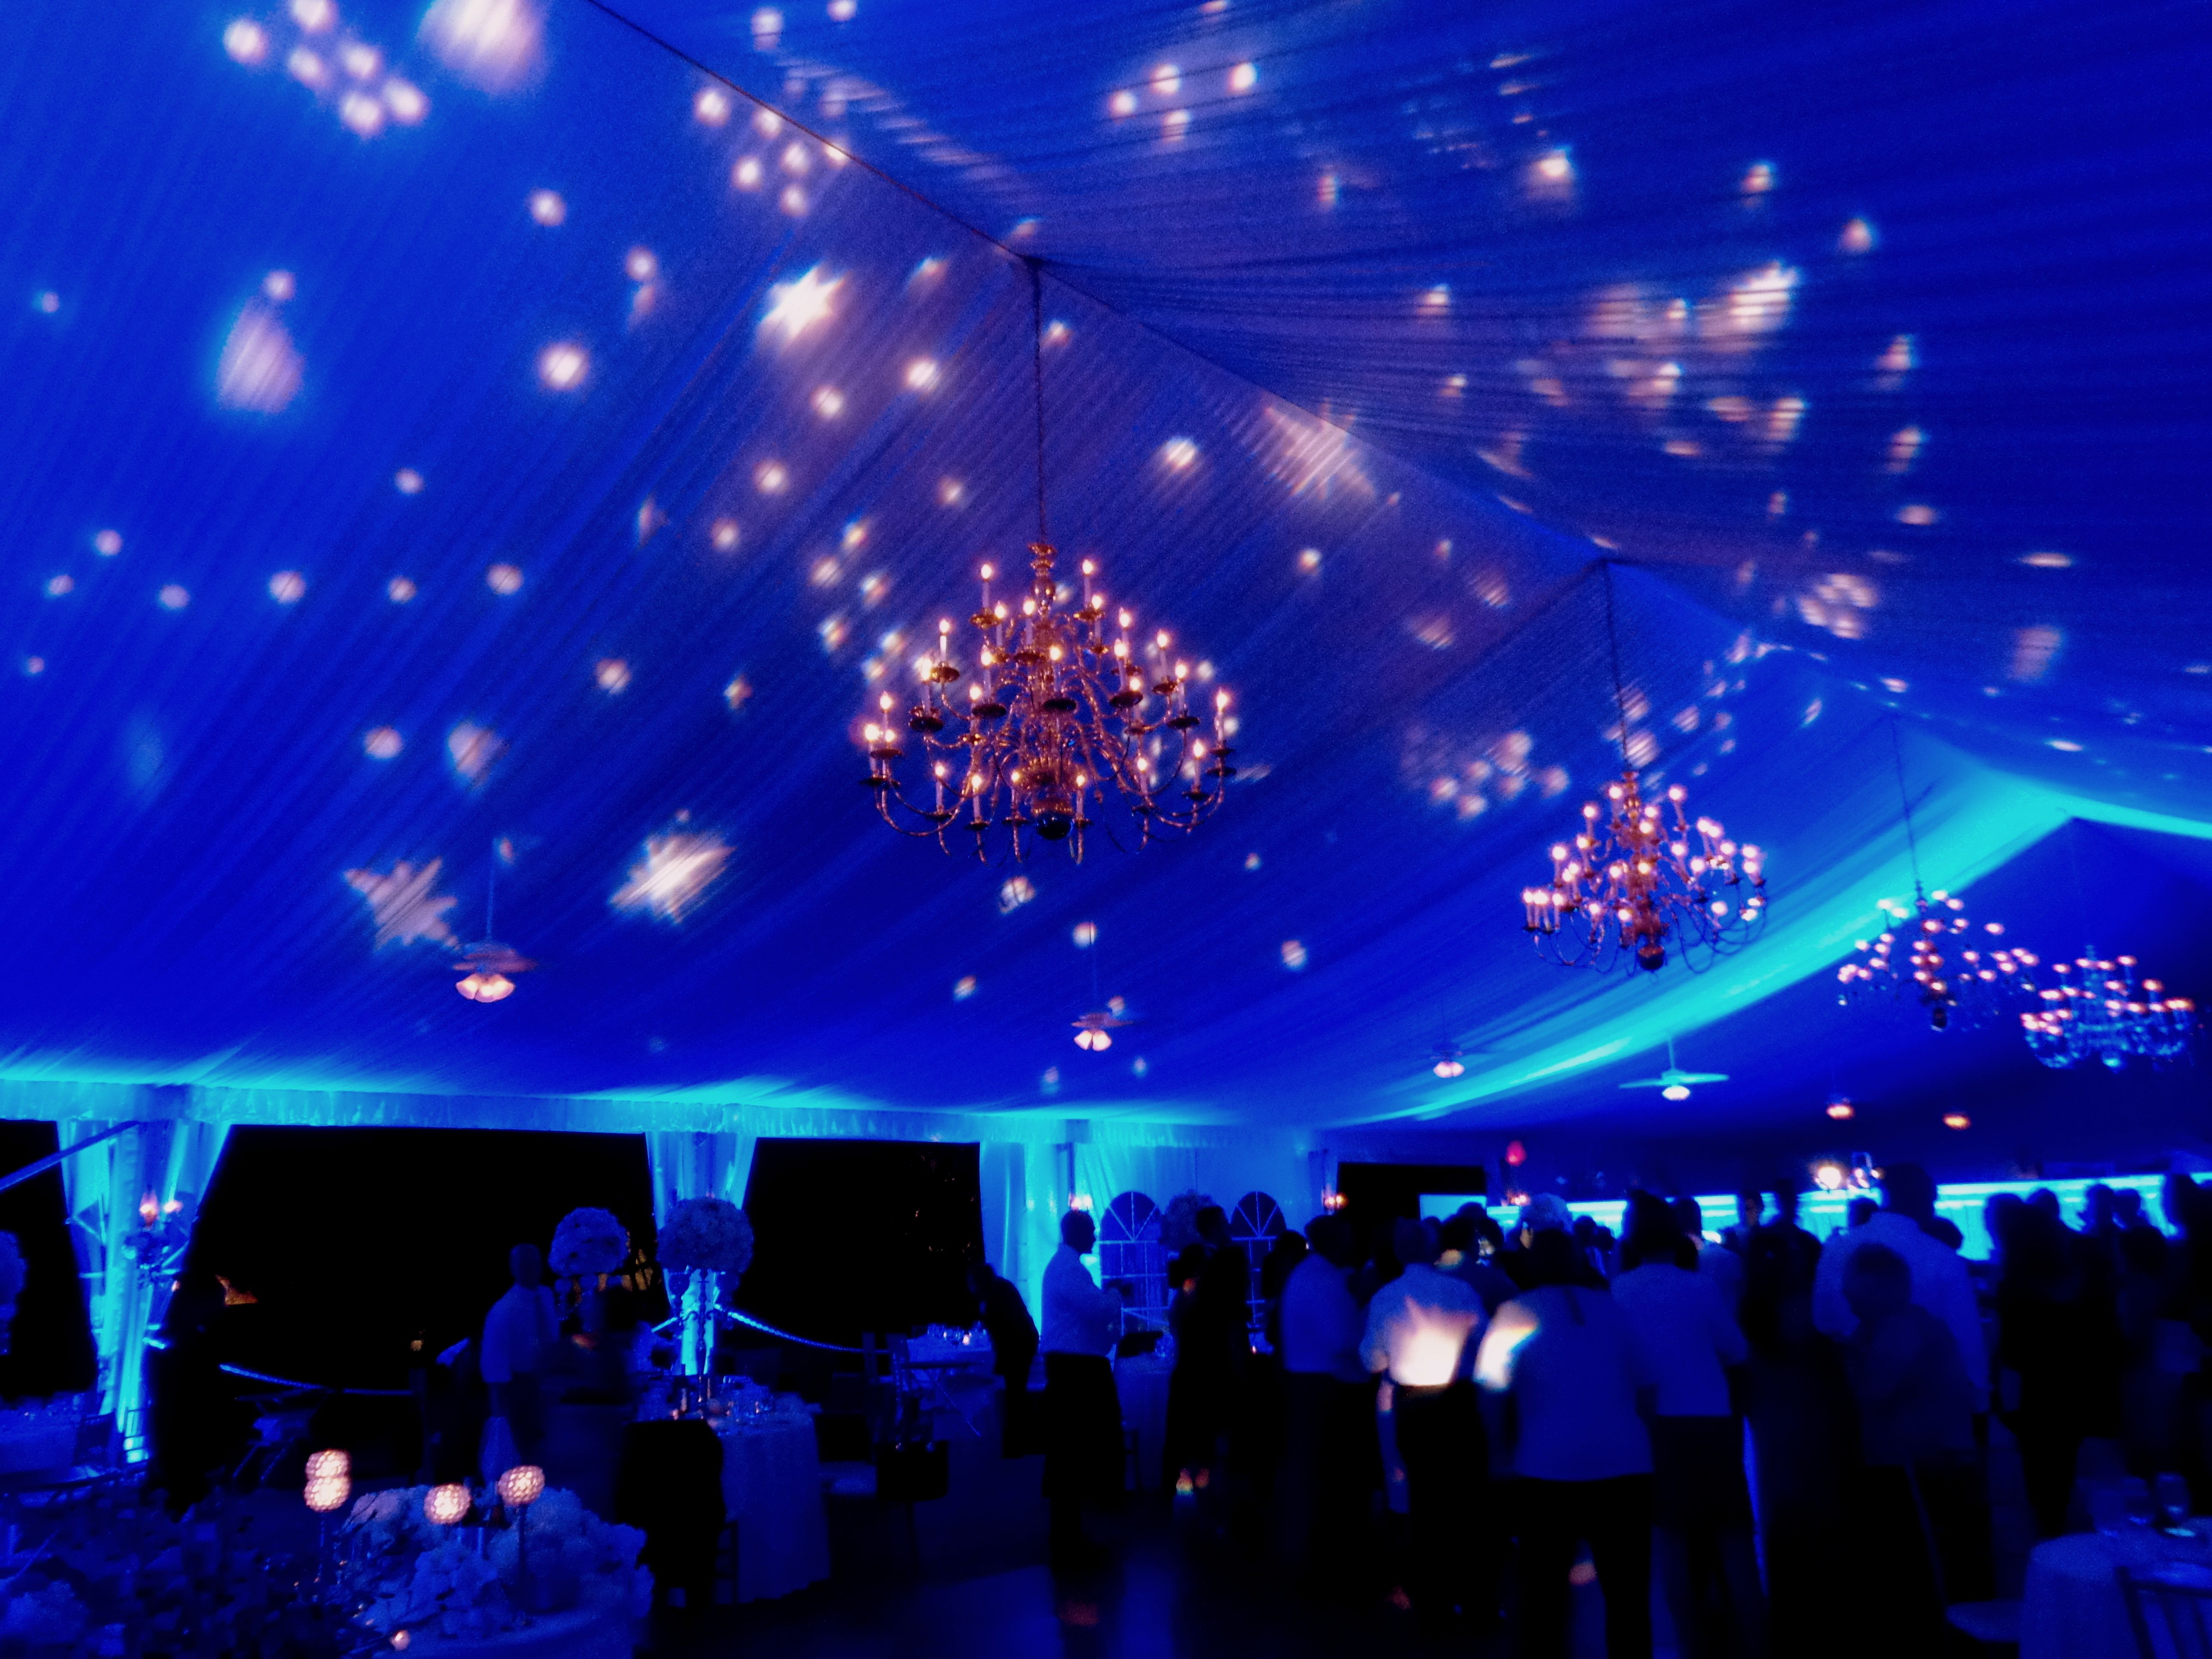 outdoor led stringsnowflake indoor string outdoorsnowflake wonderful lights blue snowflake light l lighting setssnowflake innovative christmas